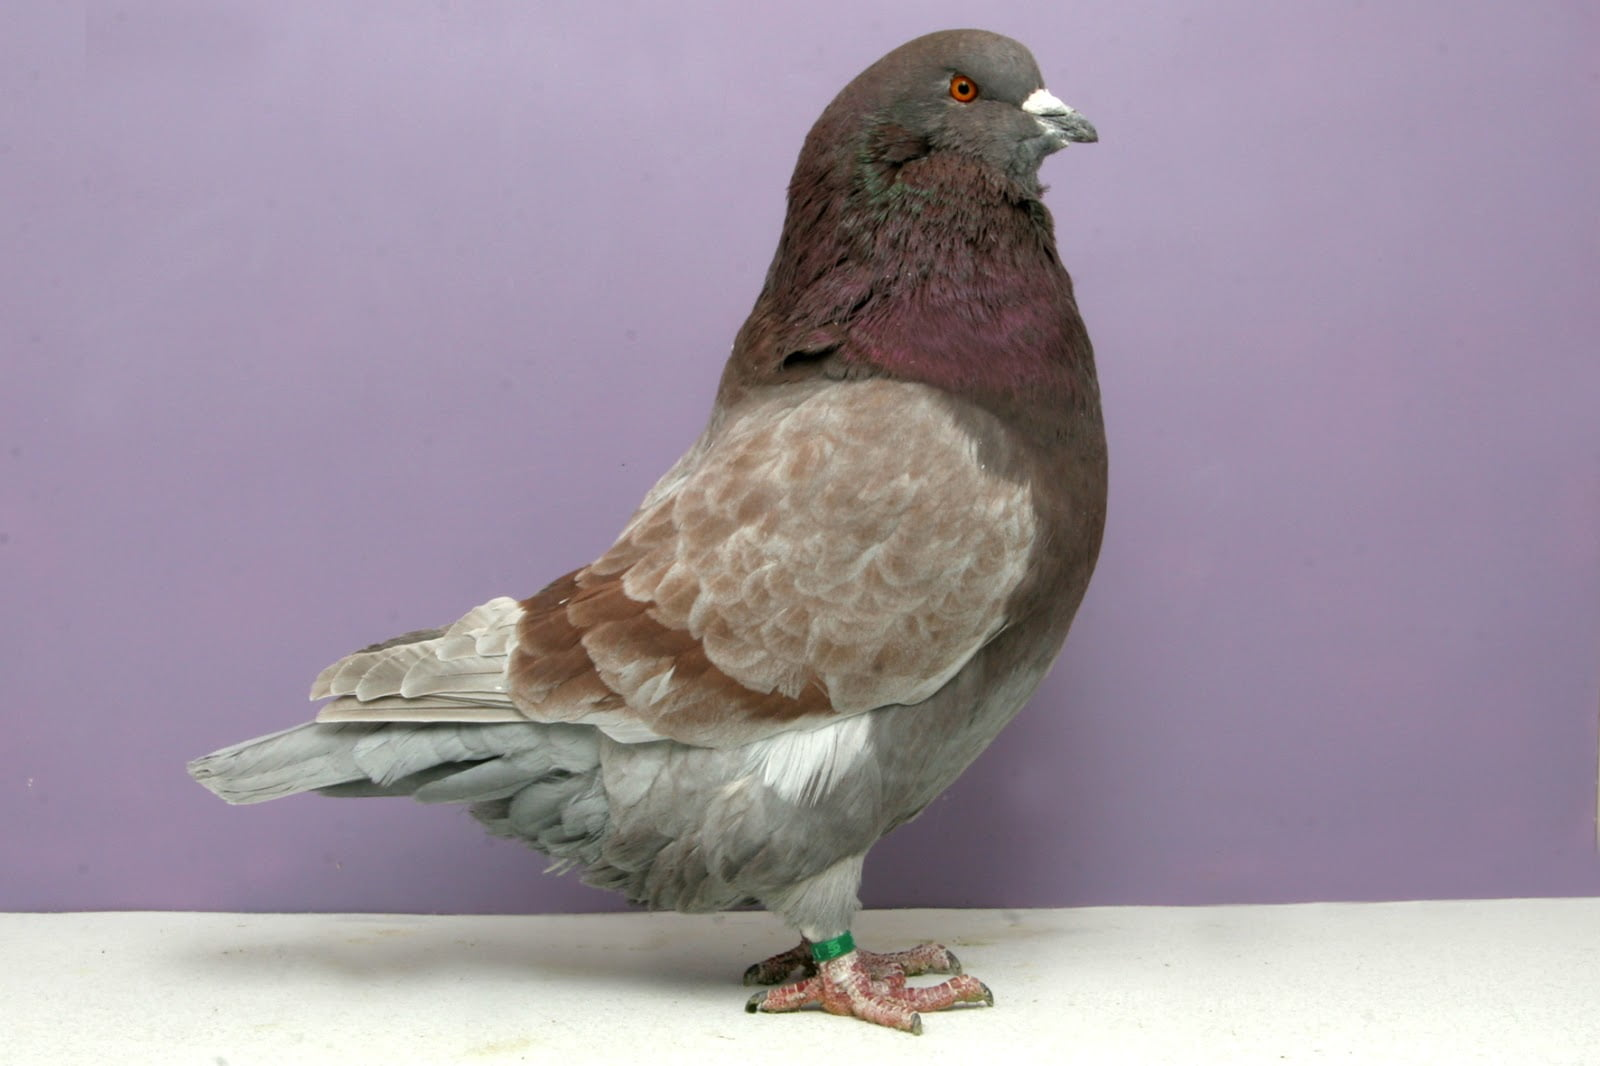 runt pigeons - american